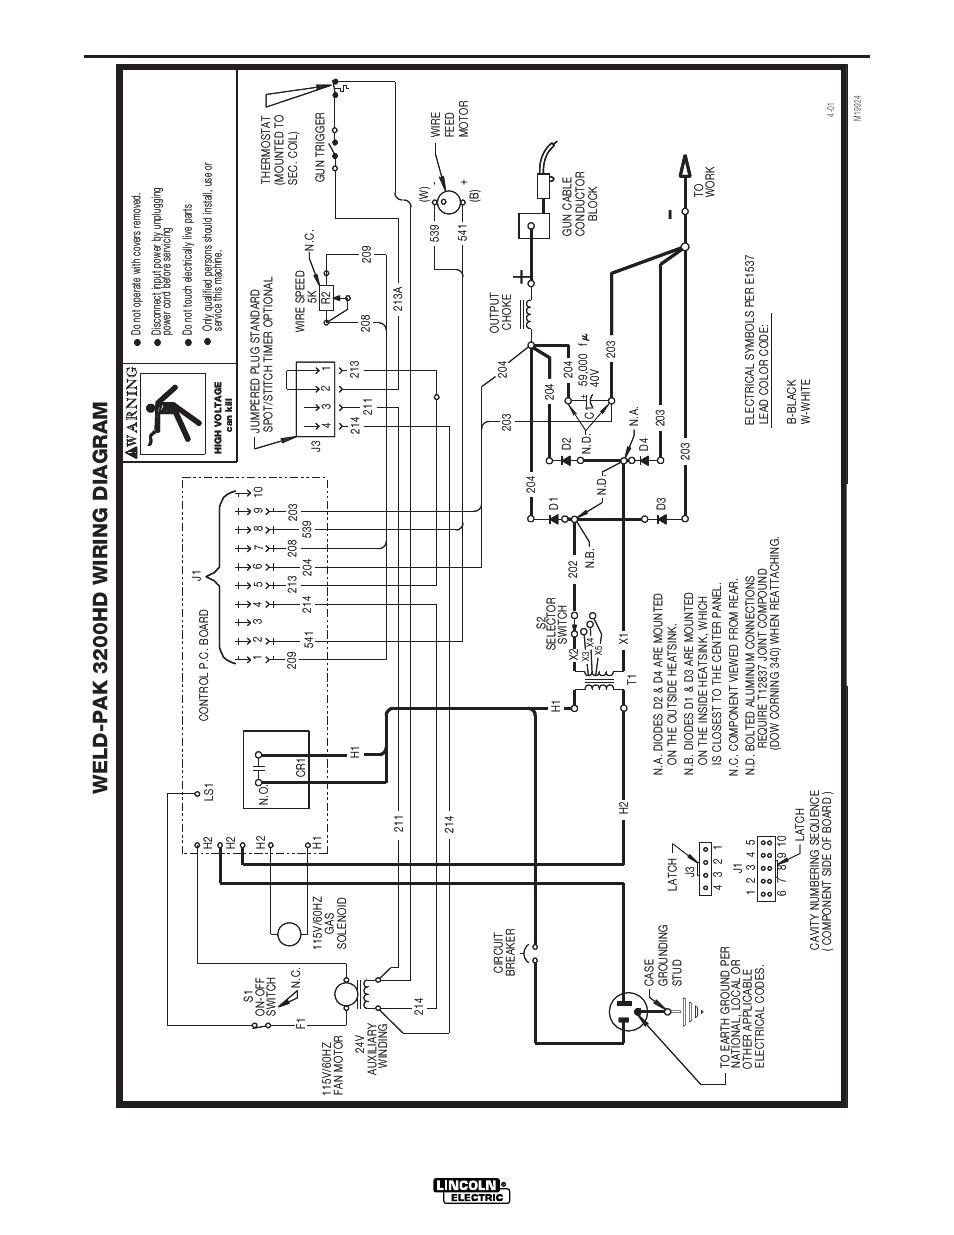 1086 International Tractor Parts Diagrams Wiring Diagram